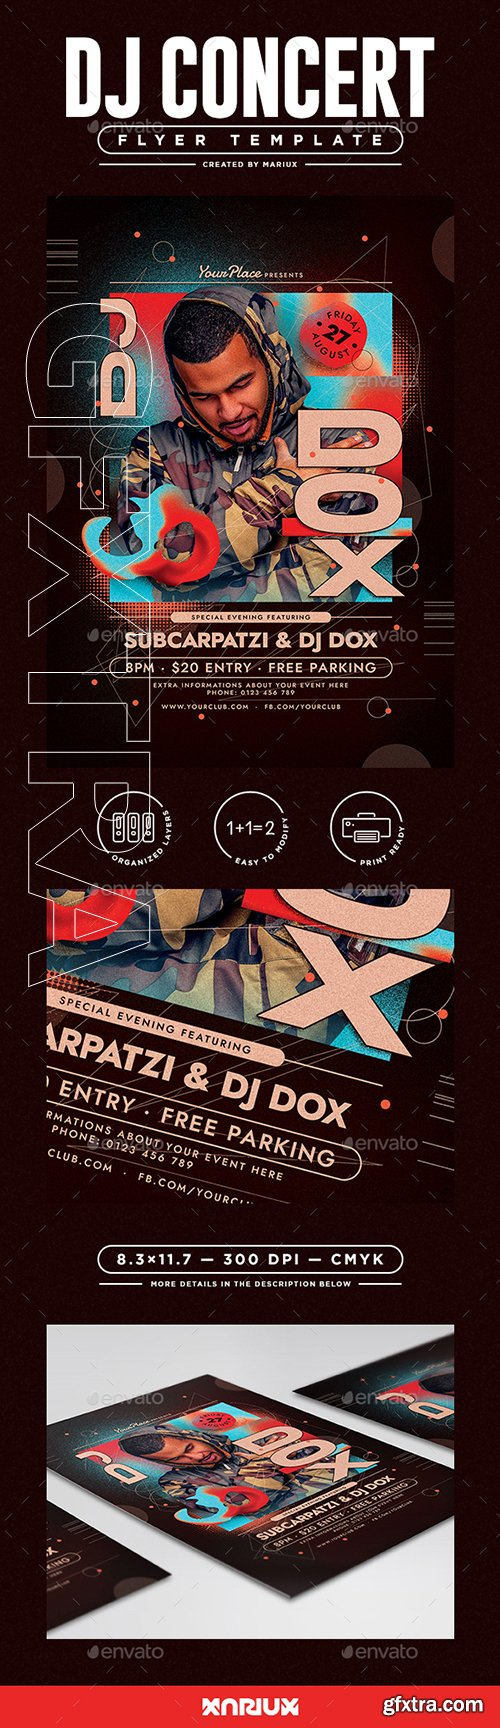 GraphicRiver - DJ Concert Flyer Template 22359175